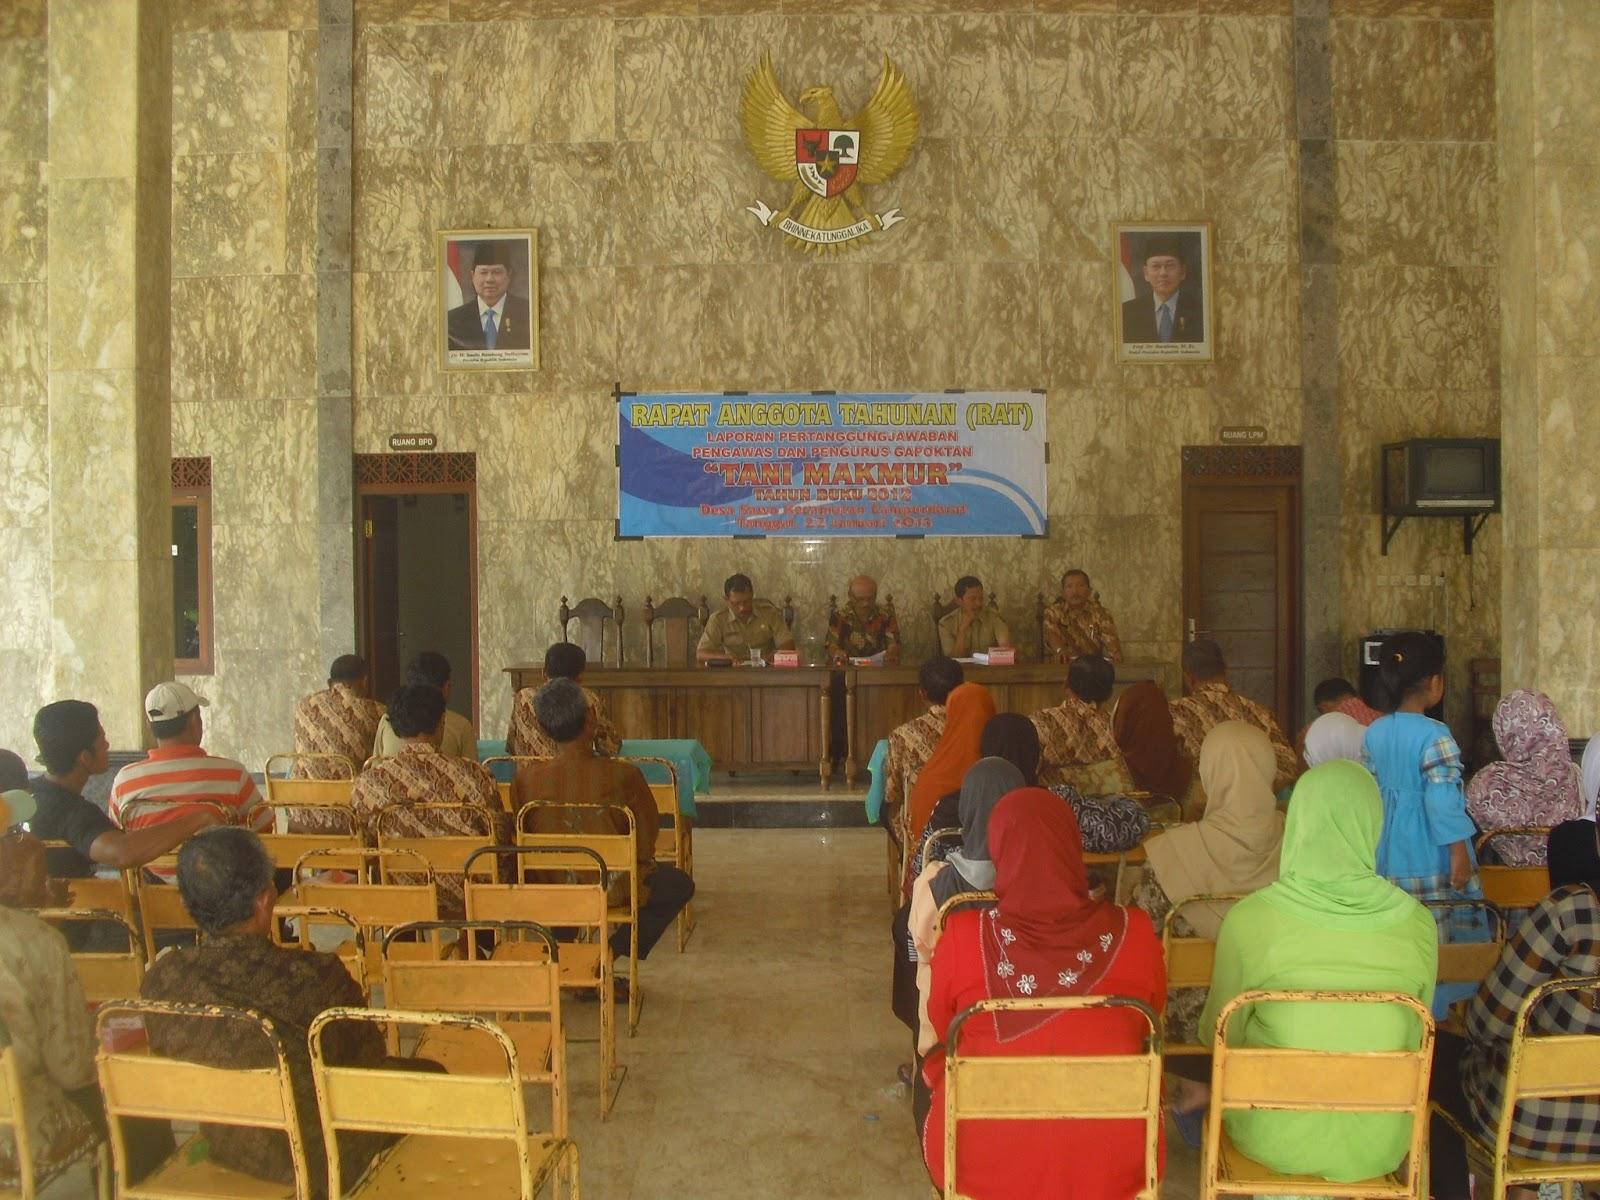 Bpp Campurdarat Tulungagung Jawa Timur Rat Gapoktan Tani Makmur Kabupaten